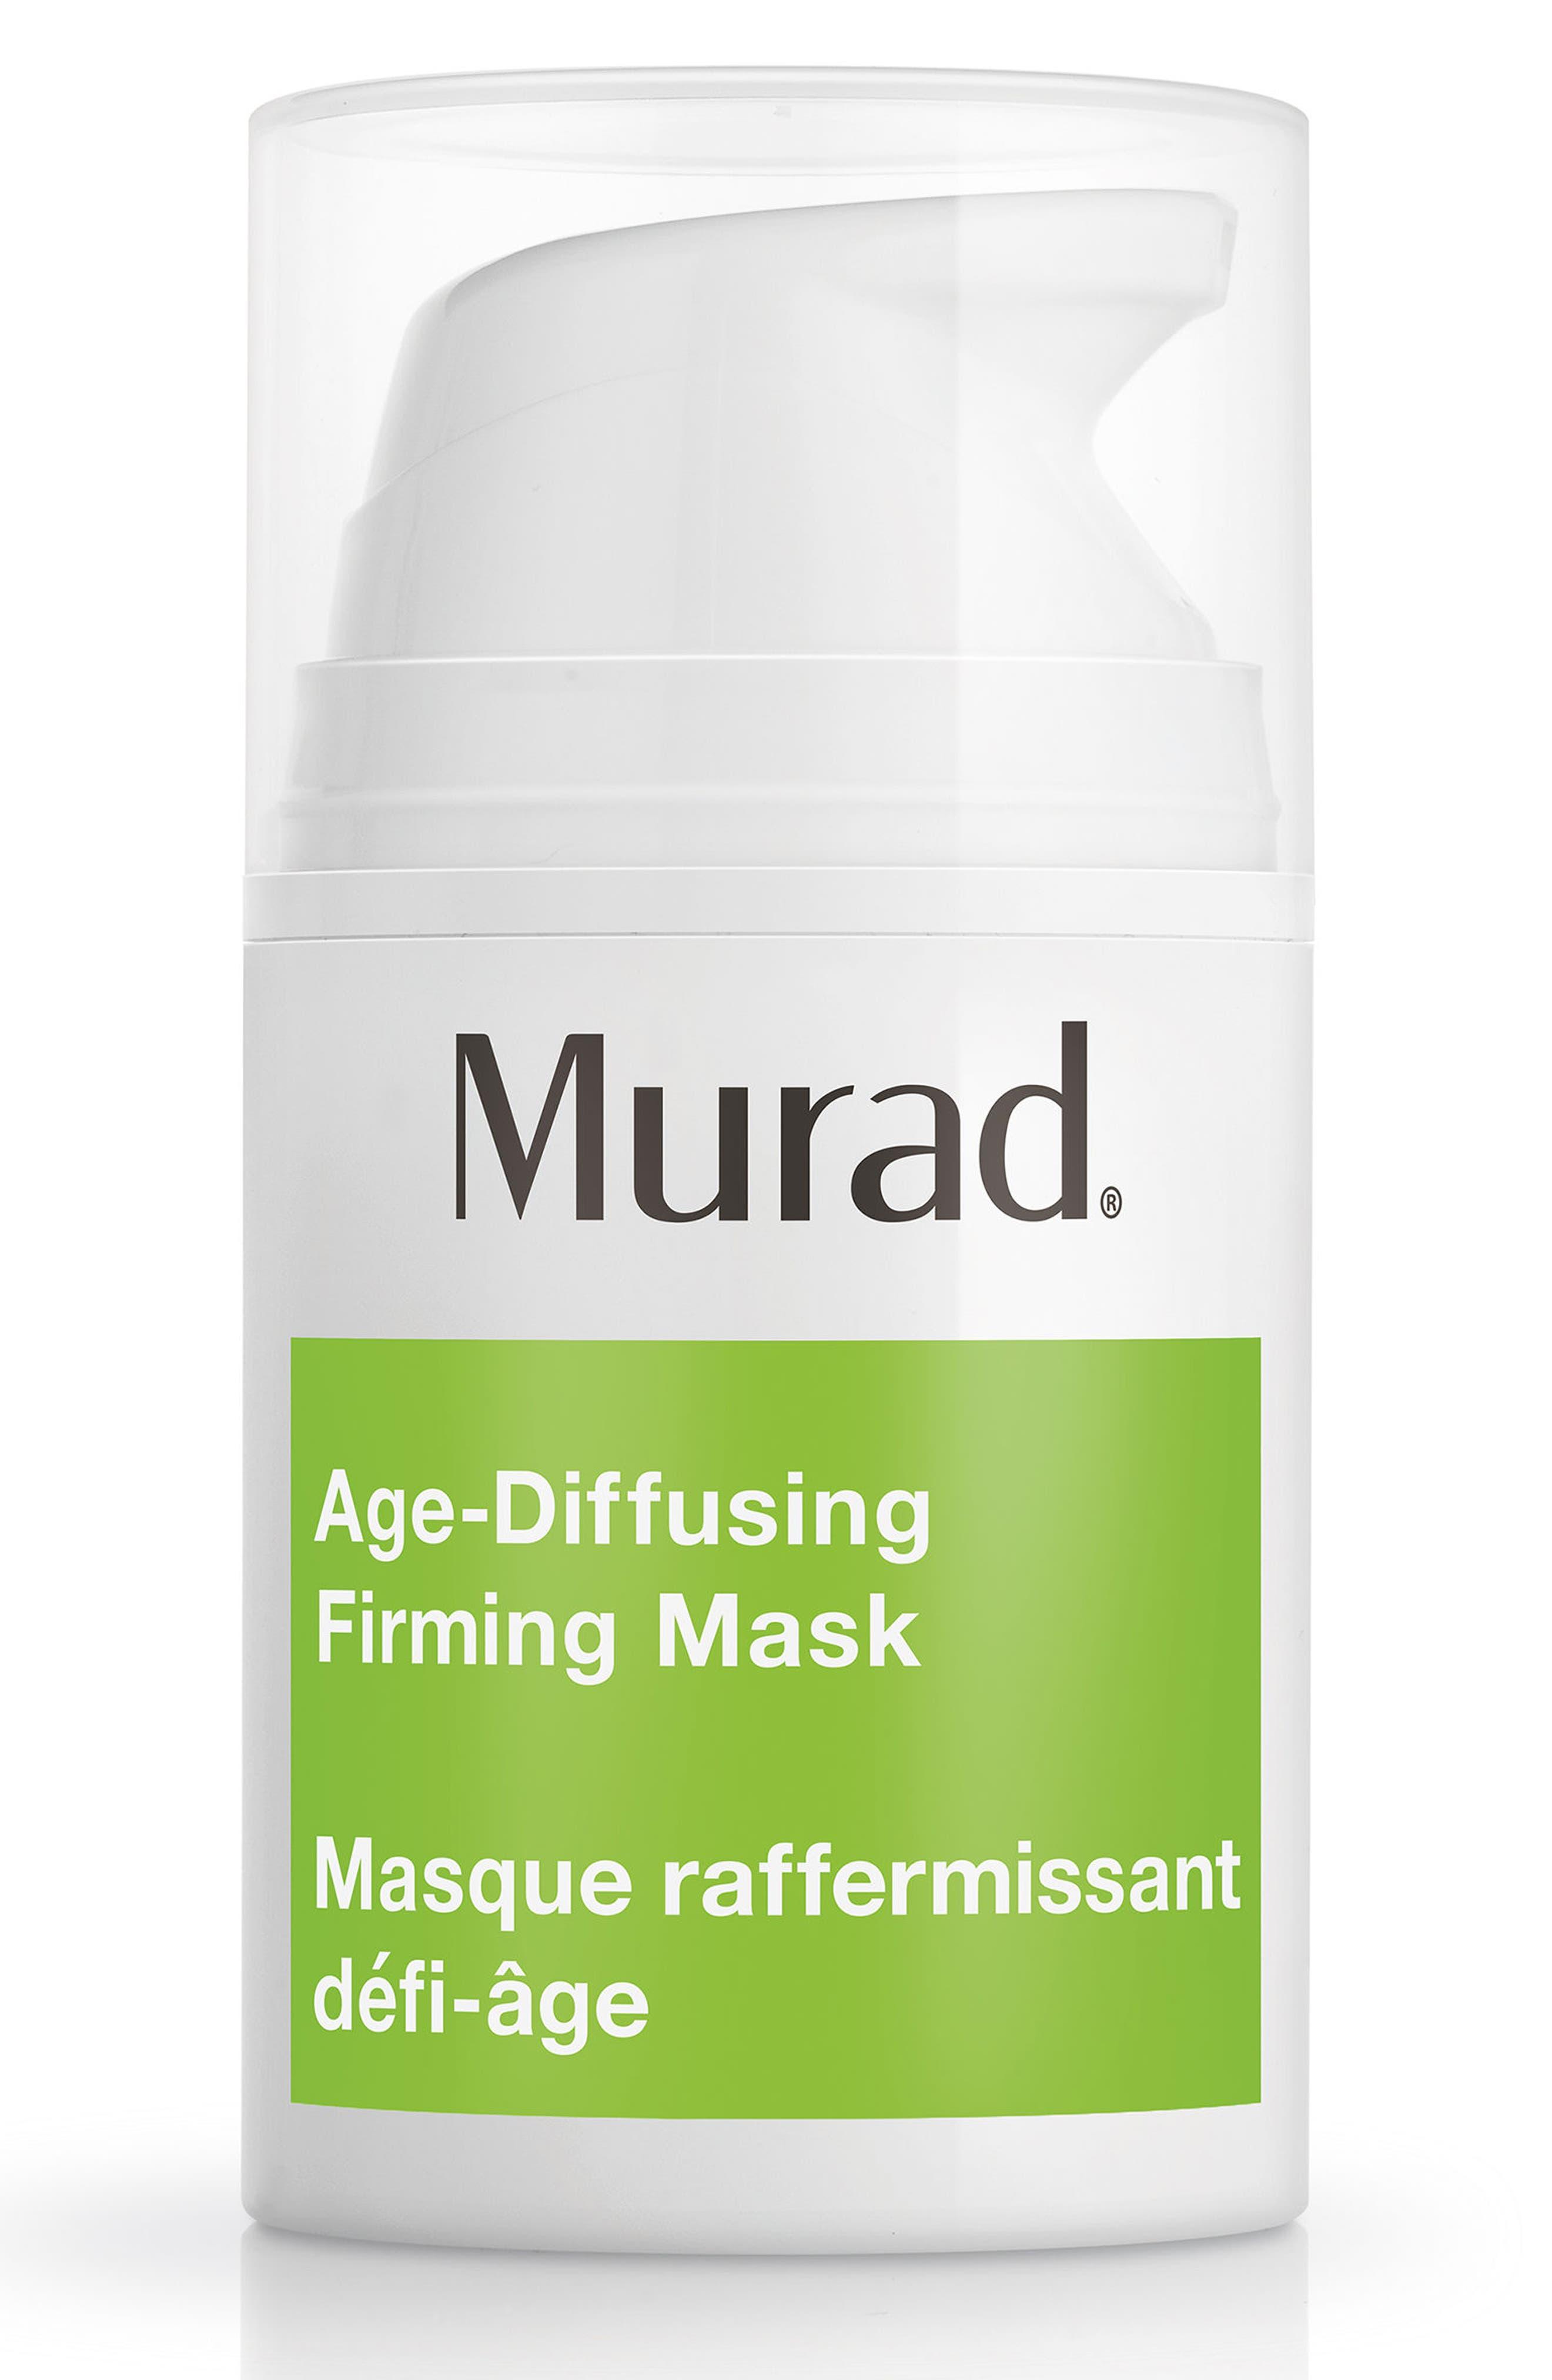 Age-Diffusing Firming Mask,                             Main thumbnail 1, color,                             No Color